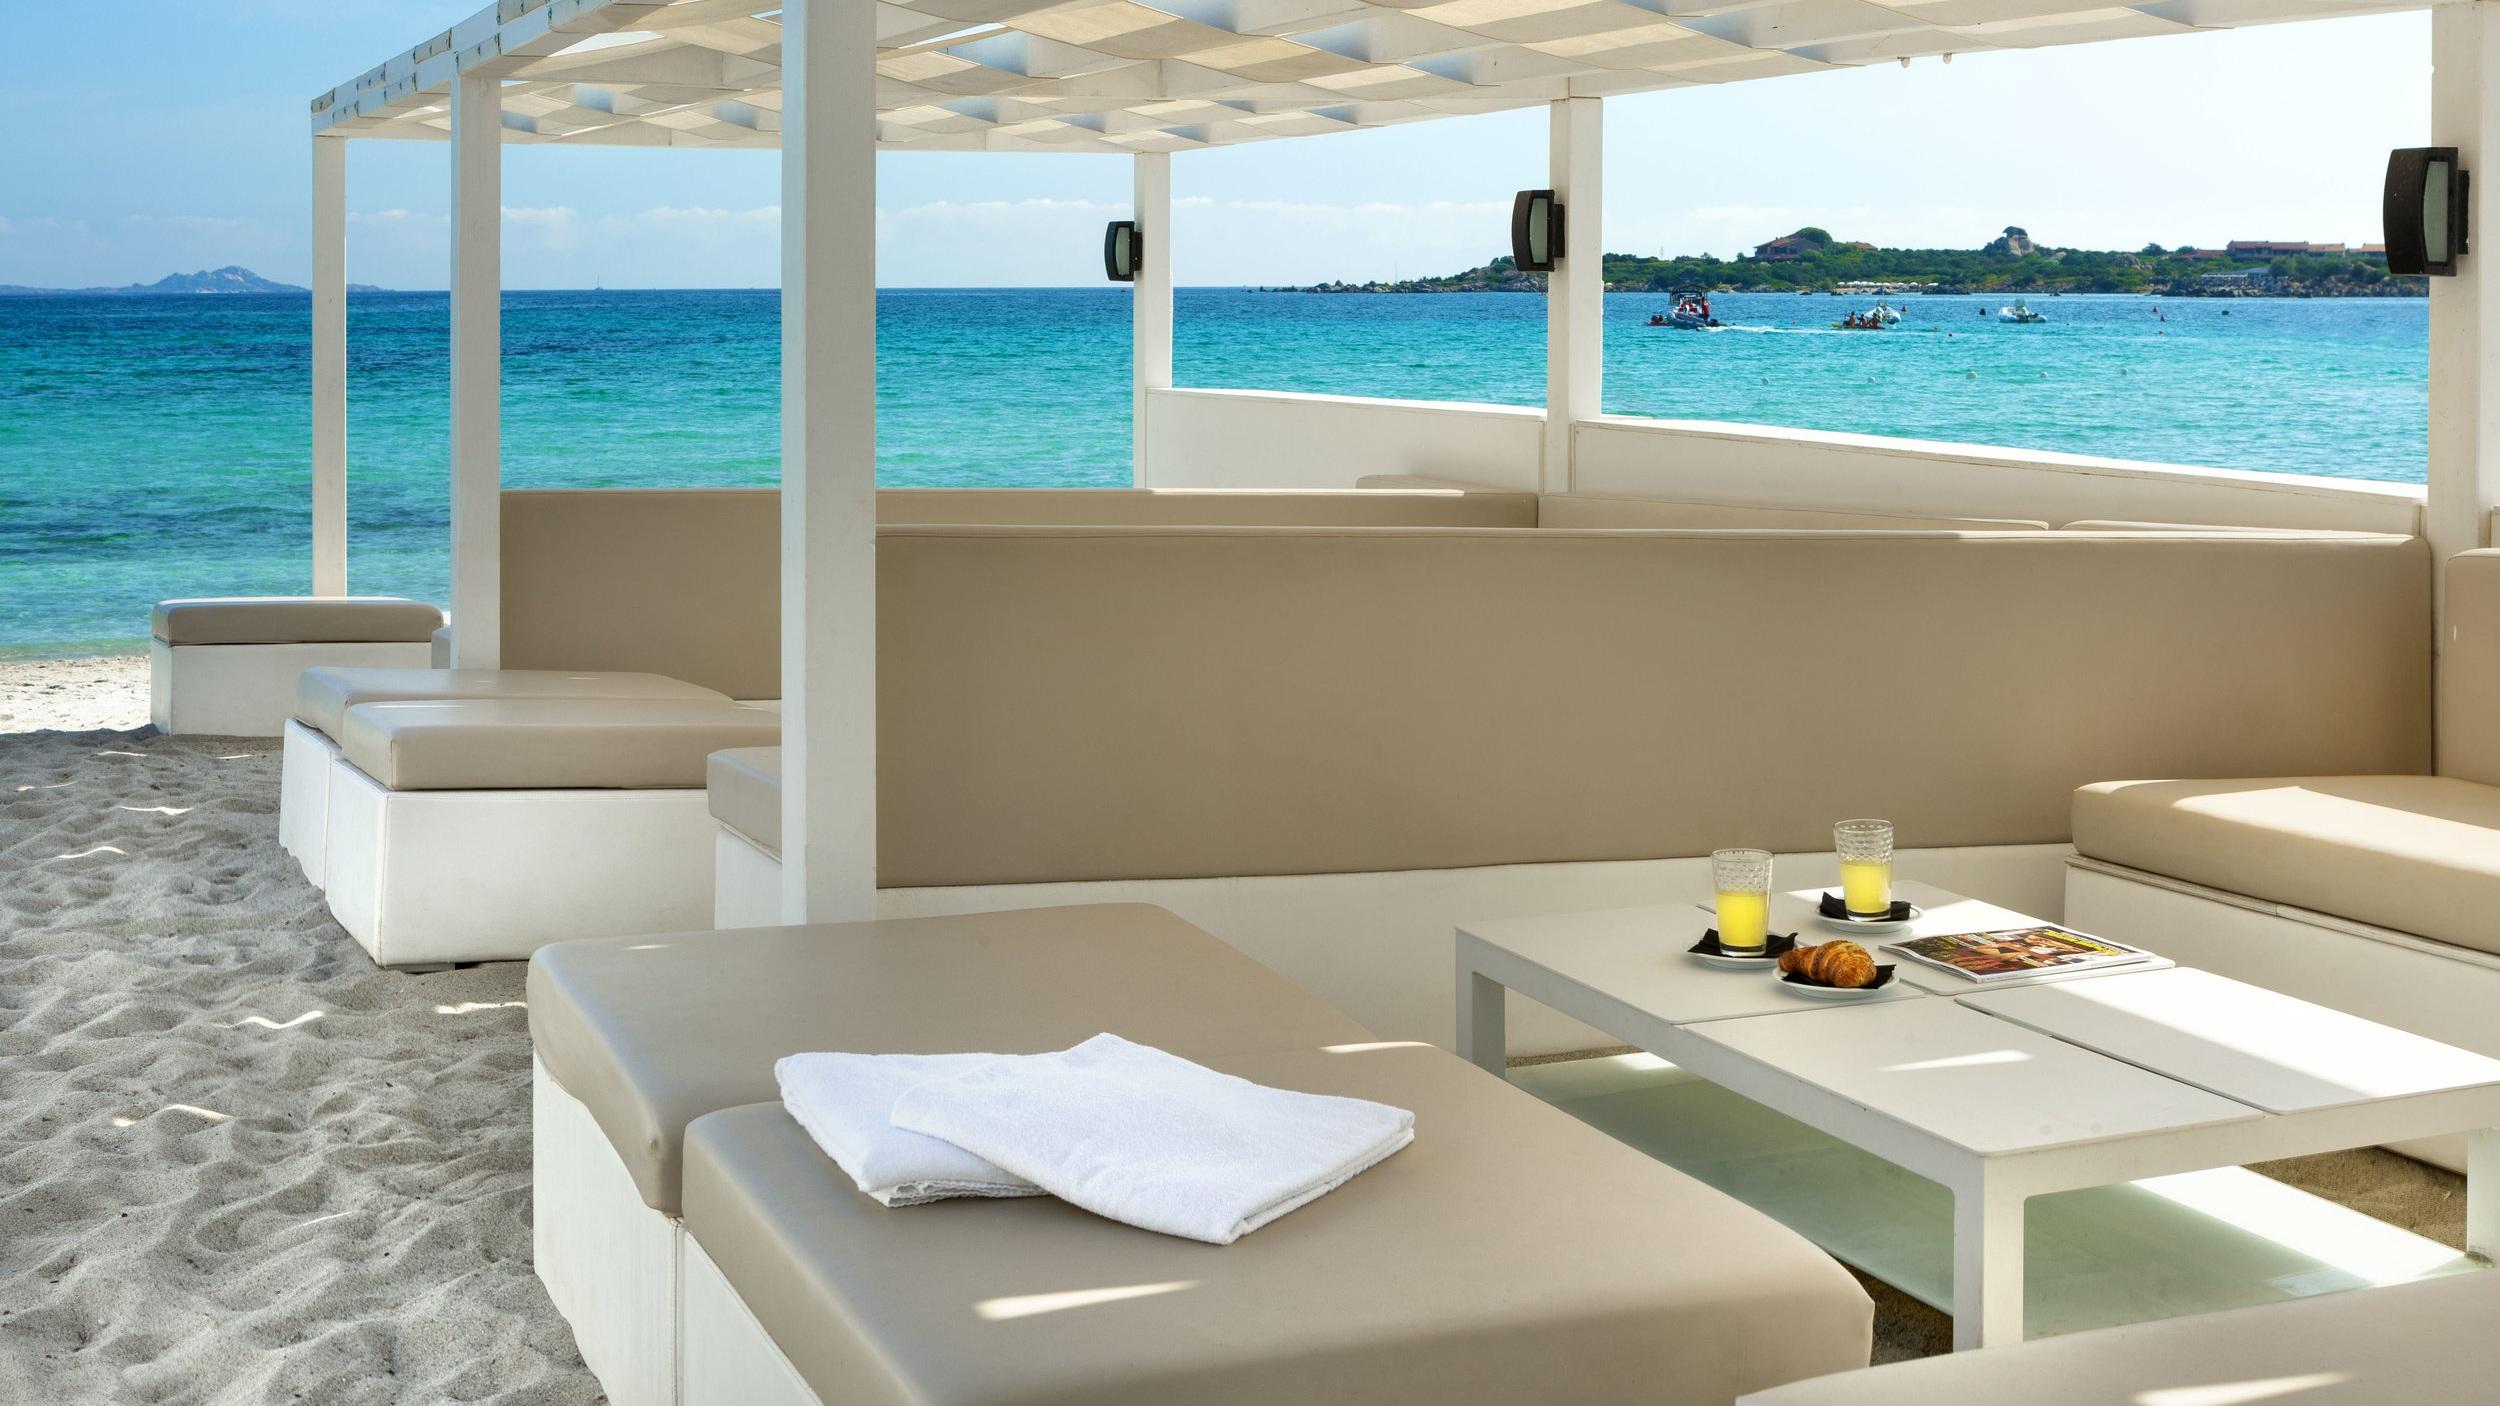 gazebo,spiaggia, marinella, beach